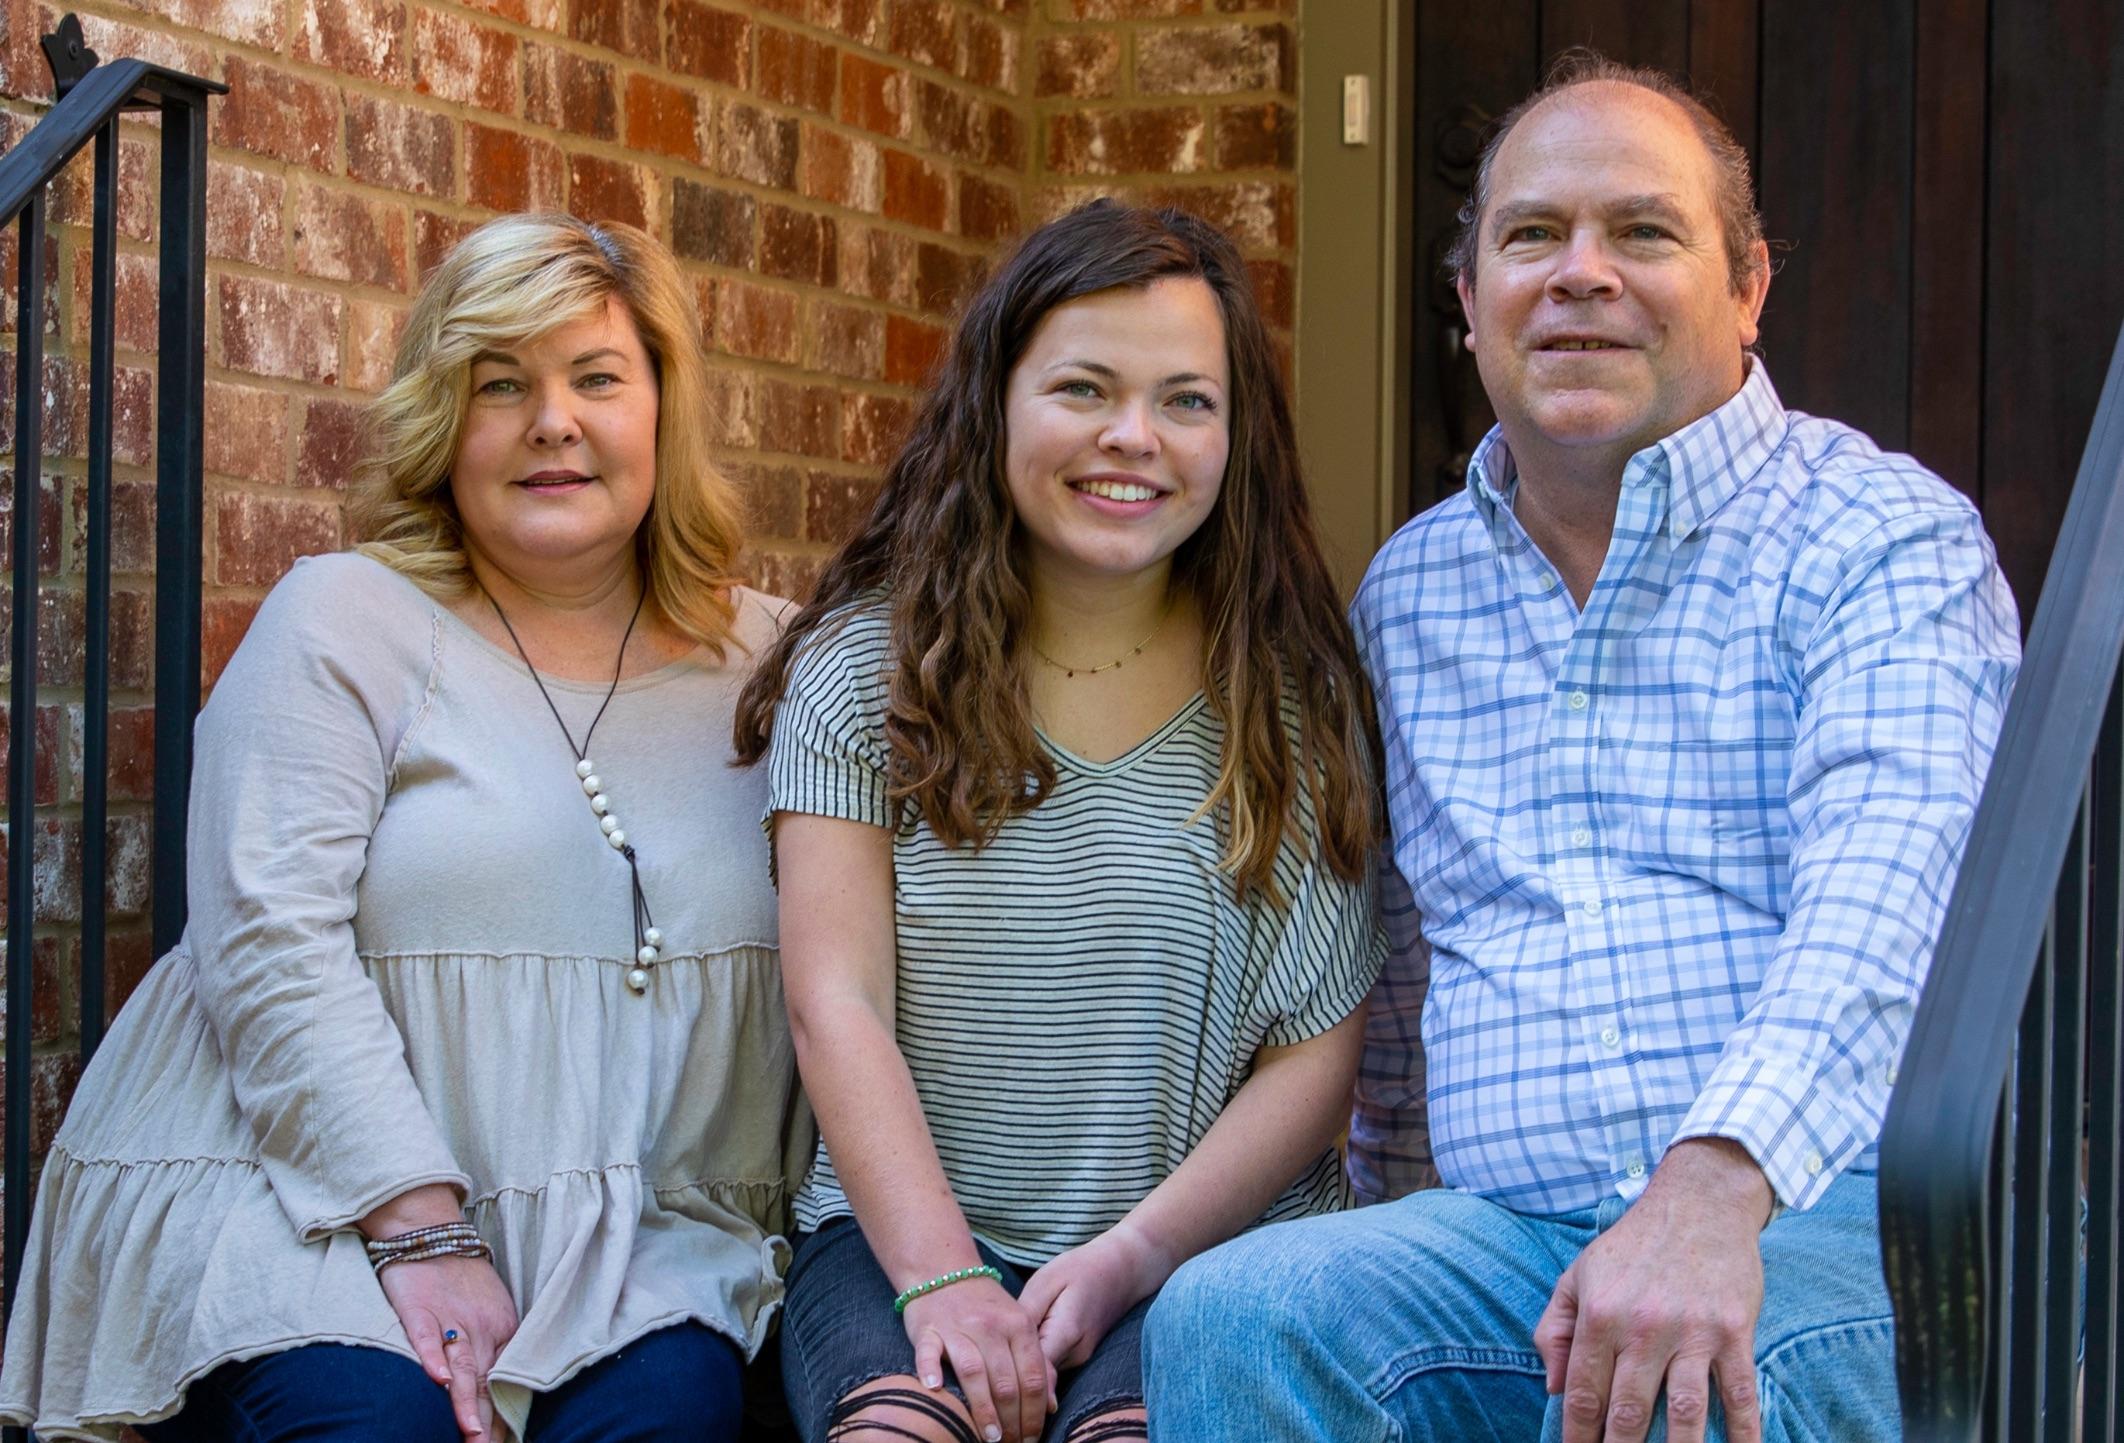 Tice Feldman, Real Estate Advisor, and family